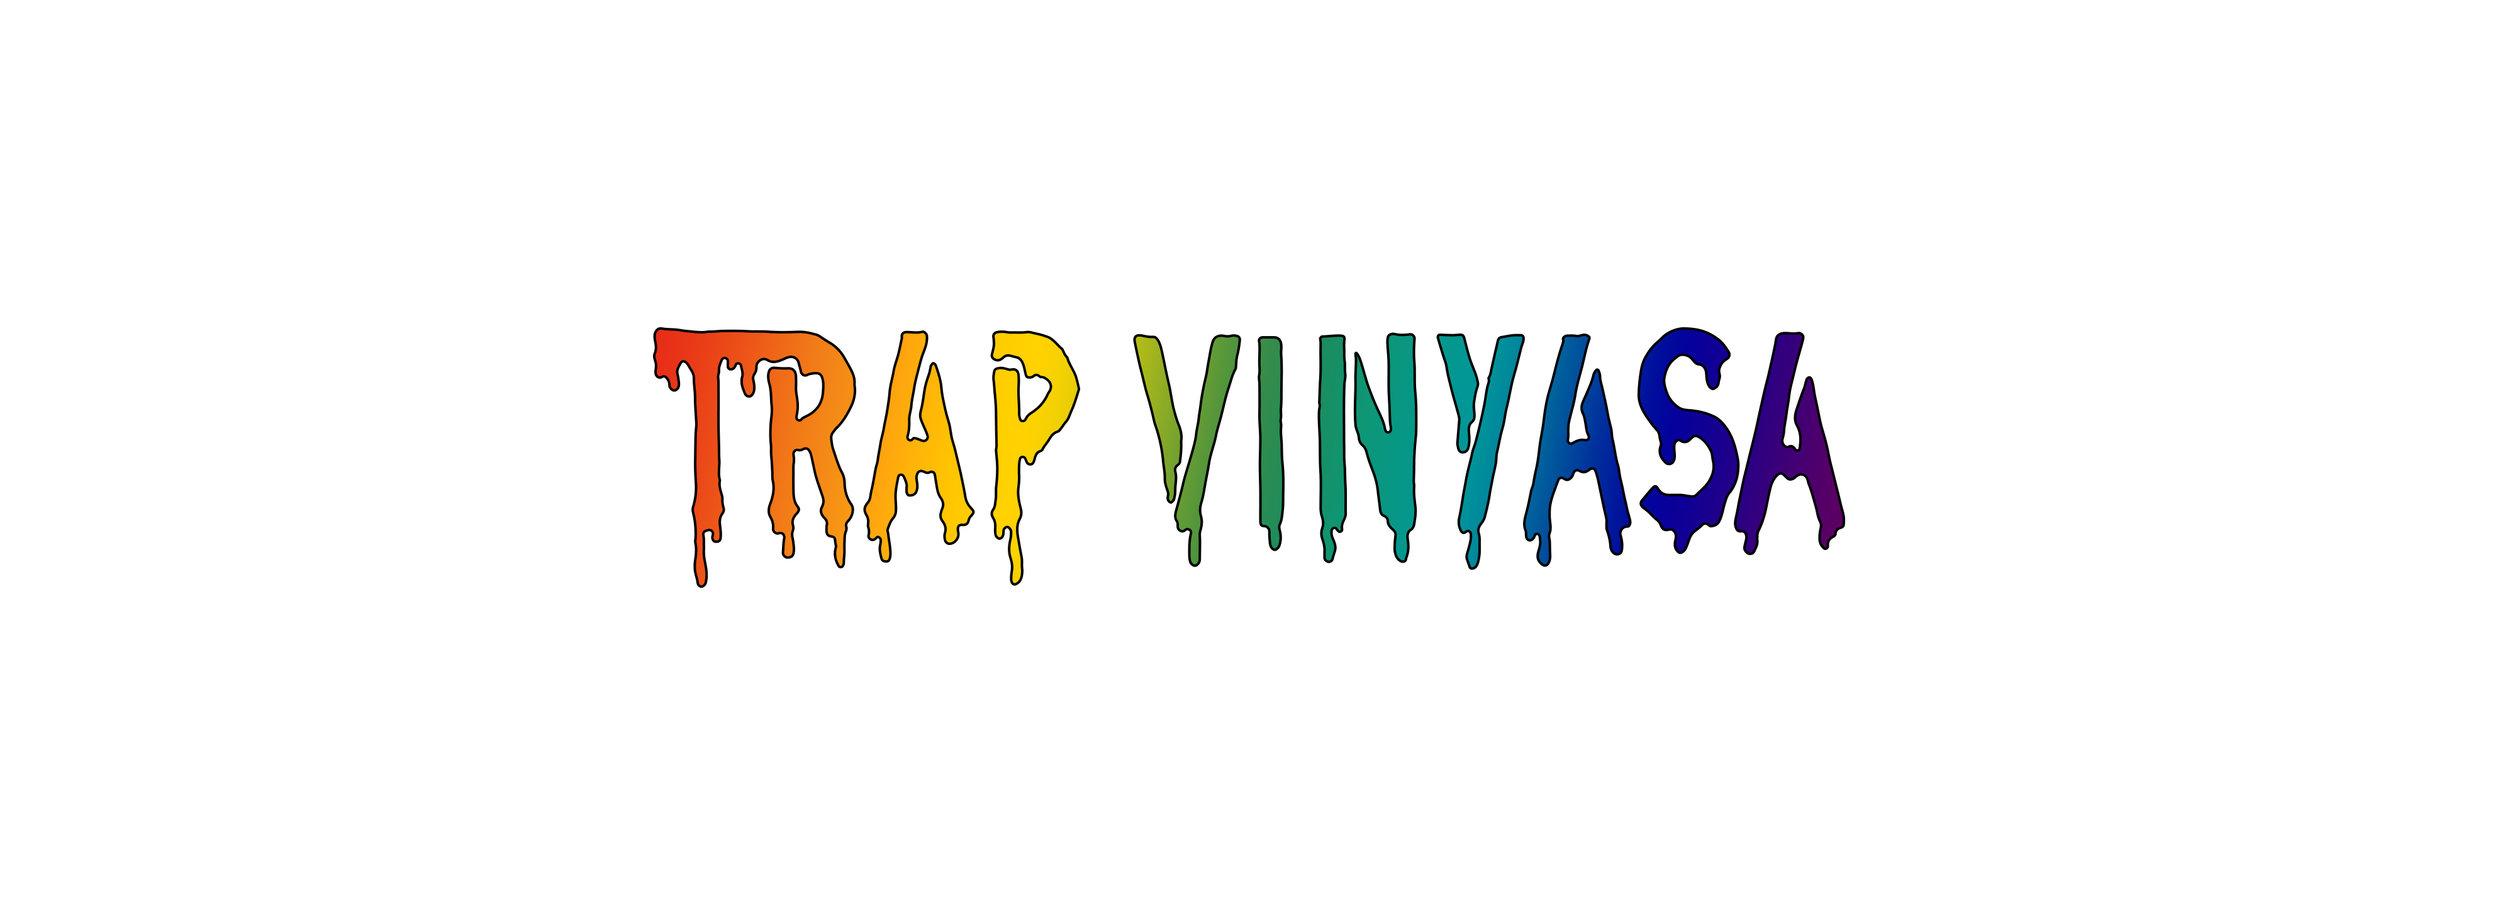 trap-vinyasa-logo-FINAL-white-banner.jpg